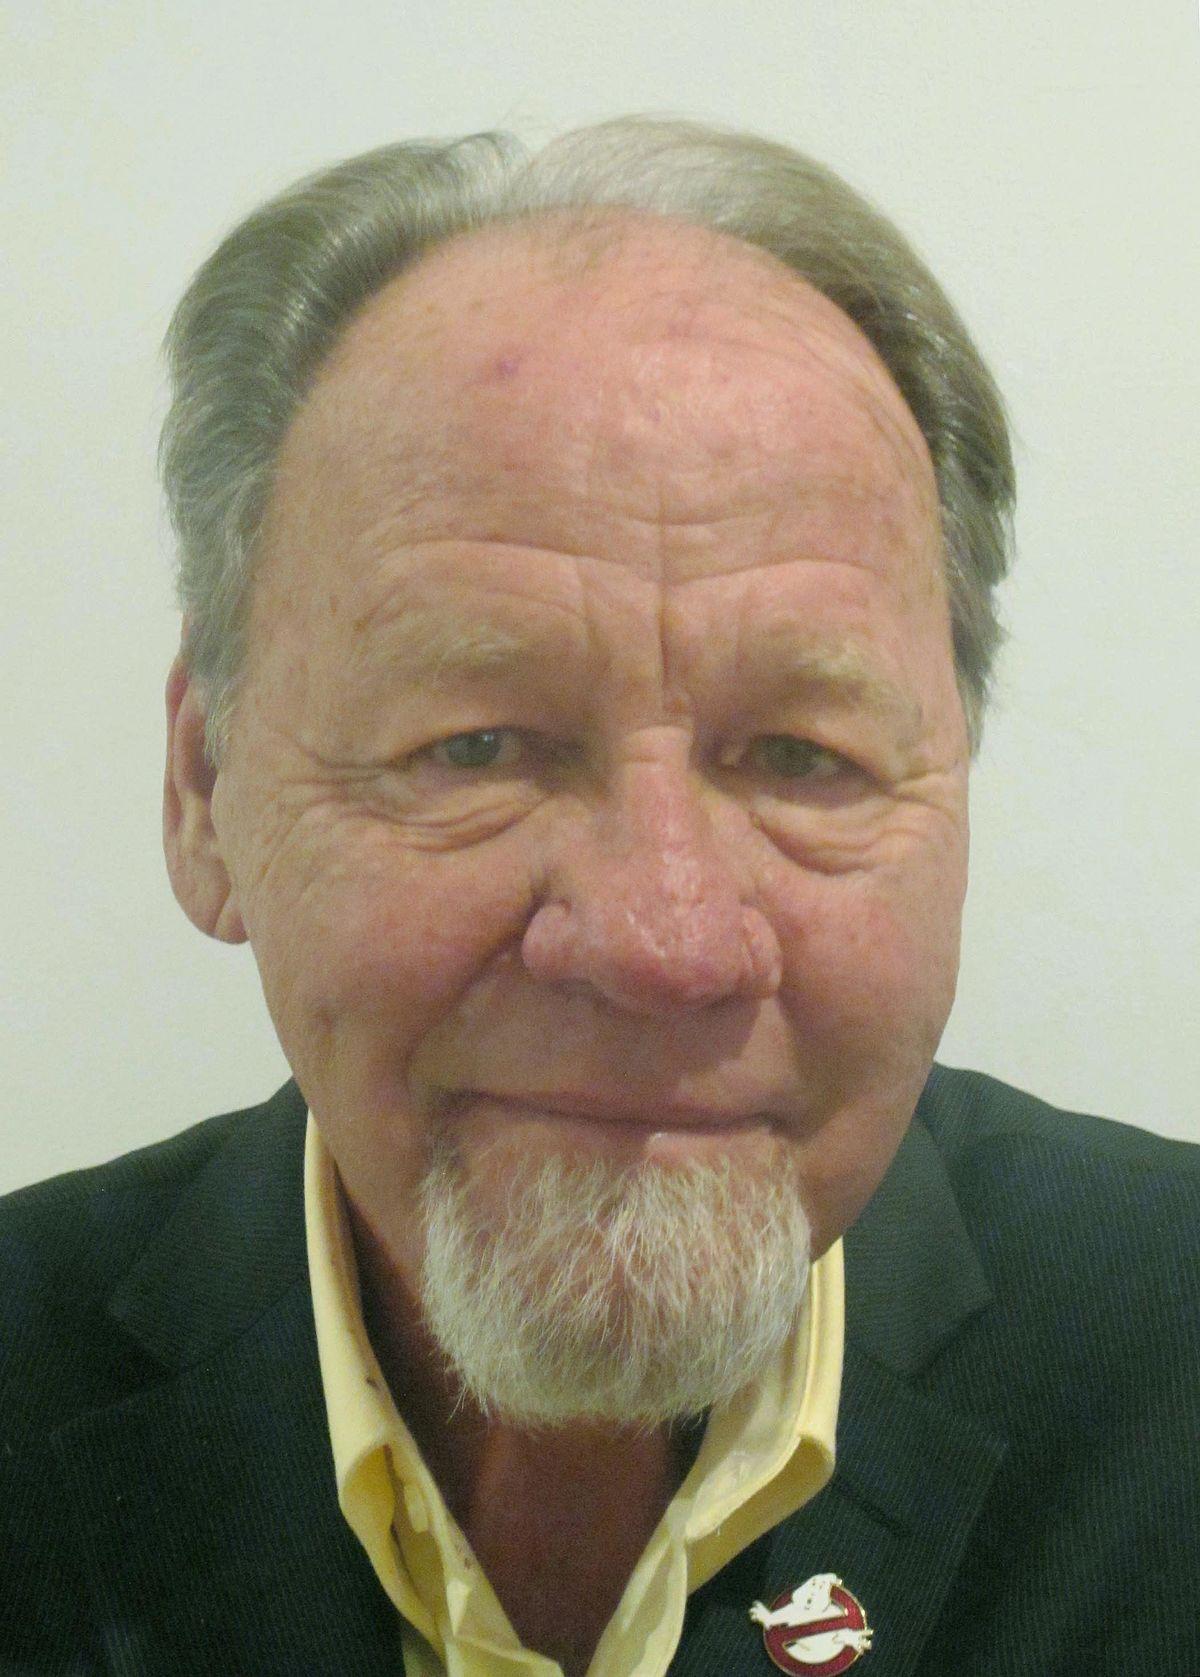 Michael C Gross Wikipedia